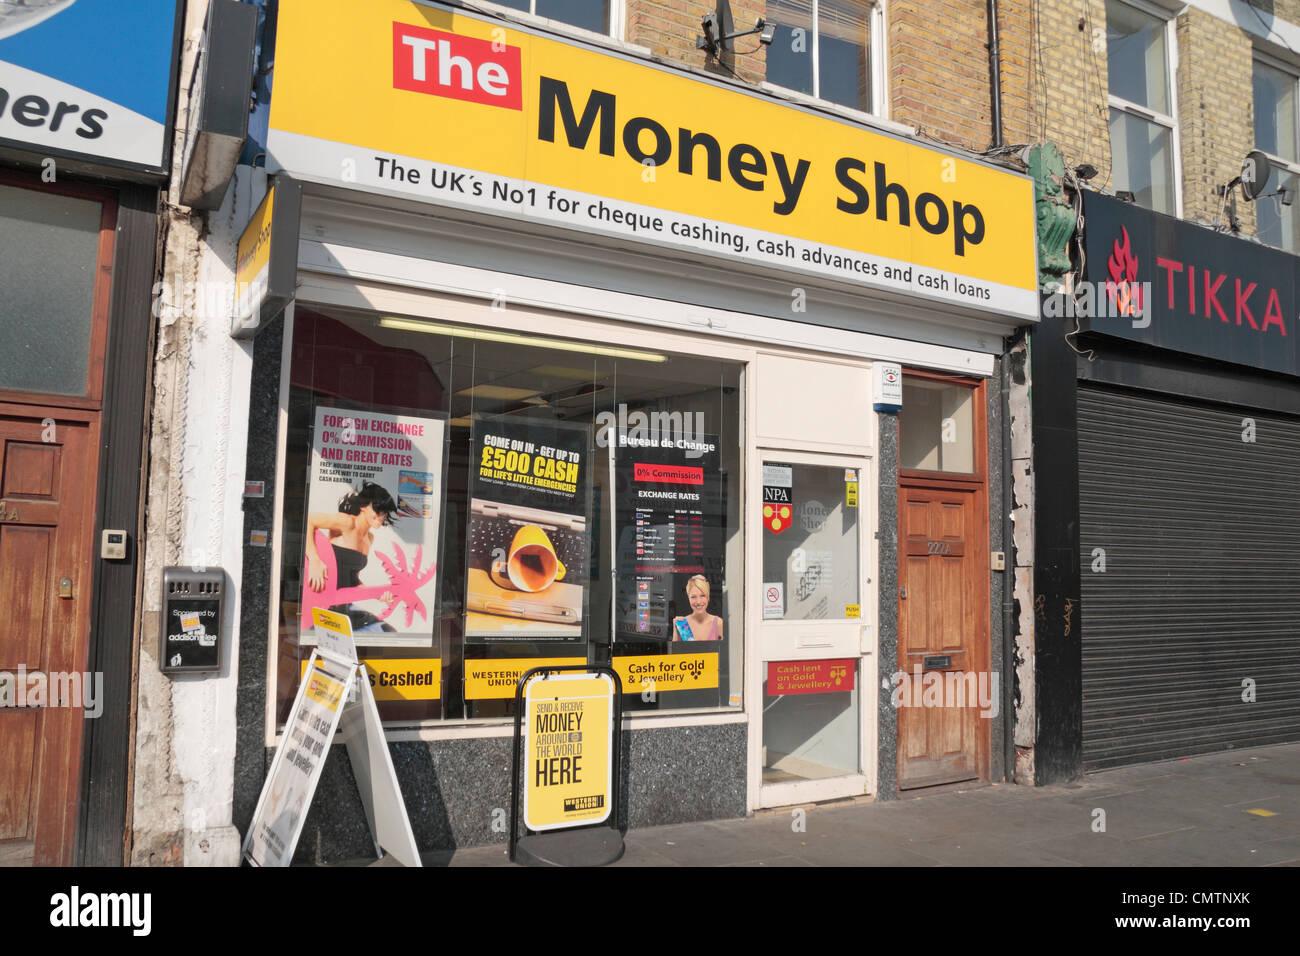 The Money Shop On Uxbridge Road Shepherds Bush West London Uk